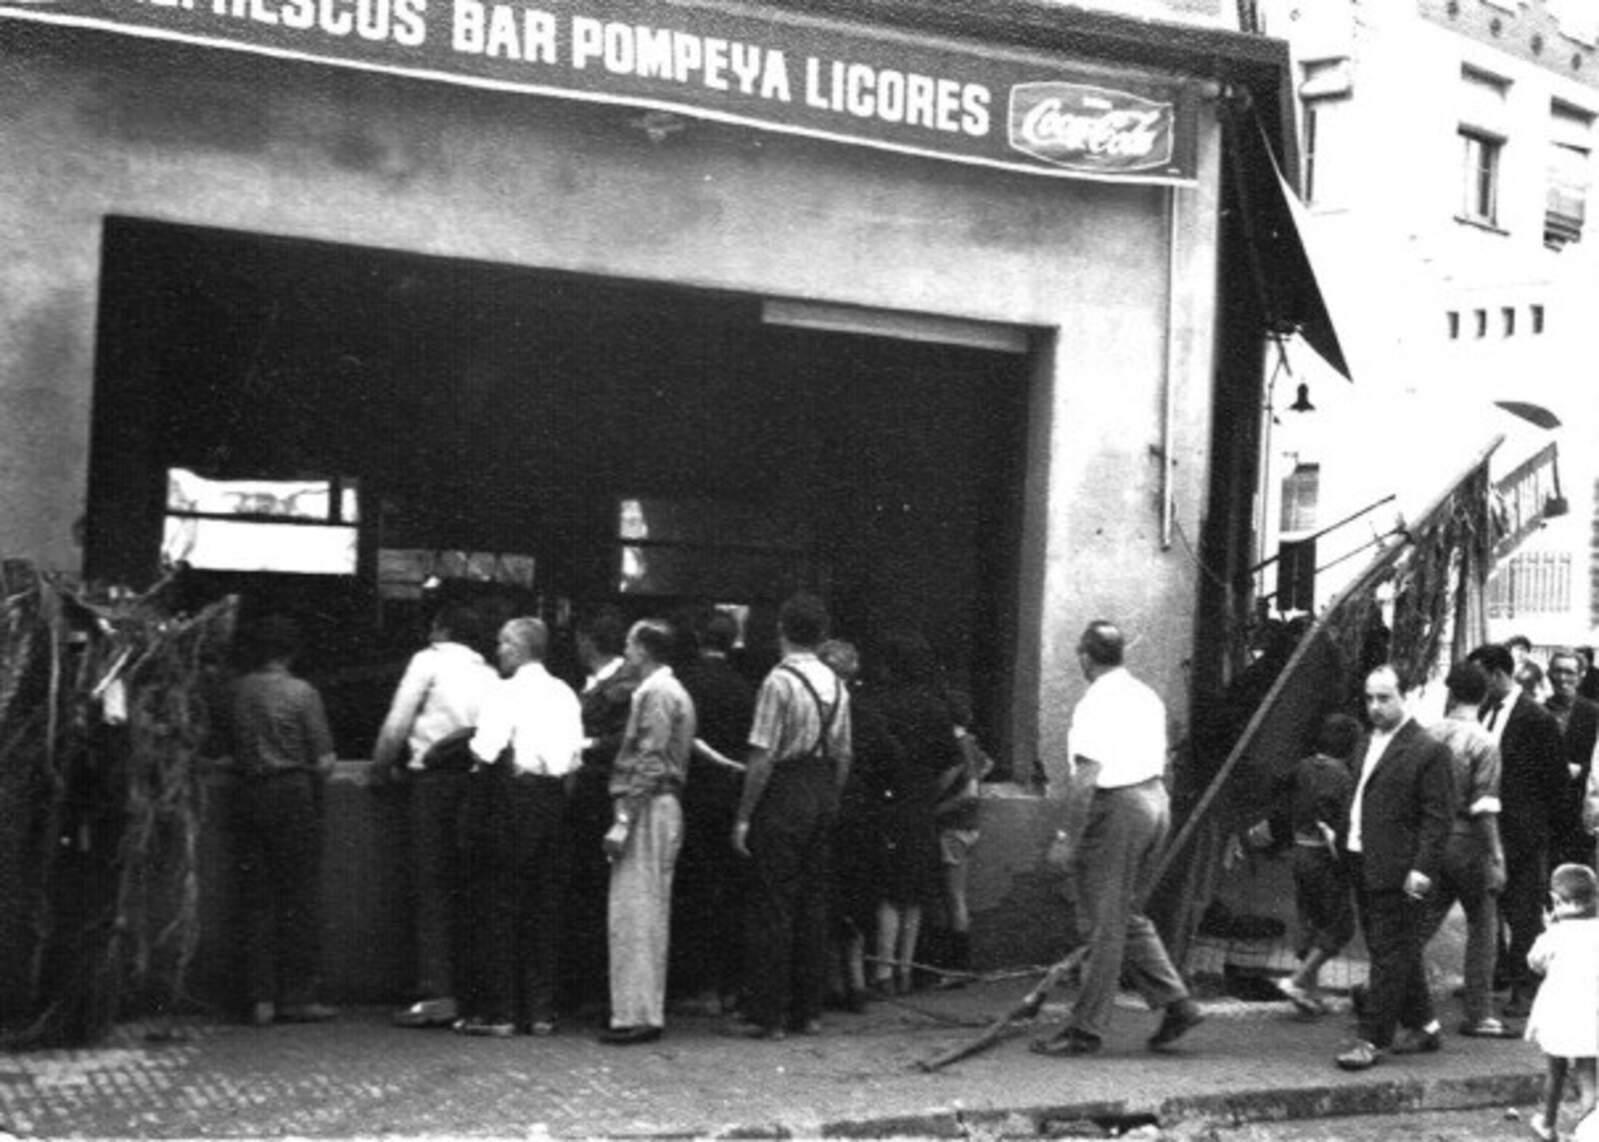 El bar Pompeya va ser víctima de la riuada